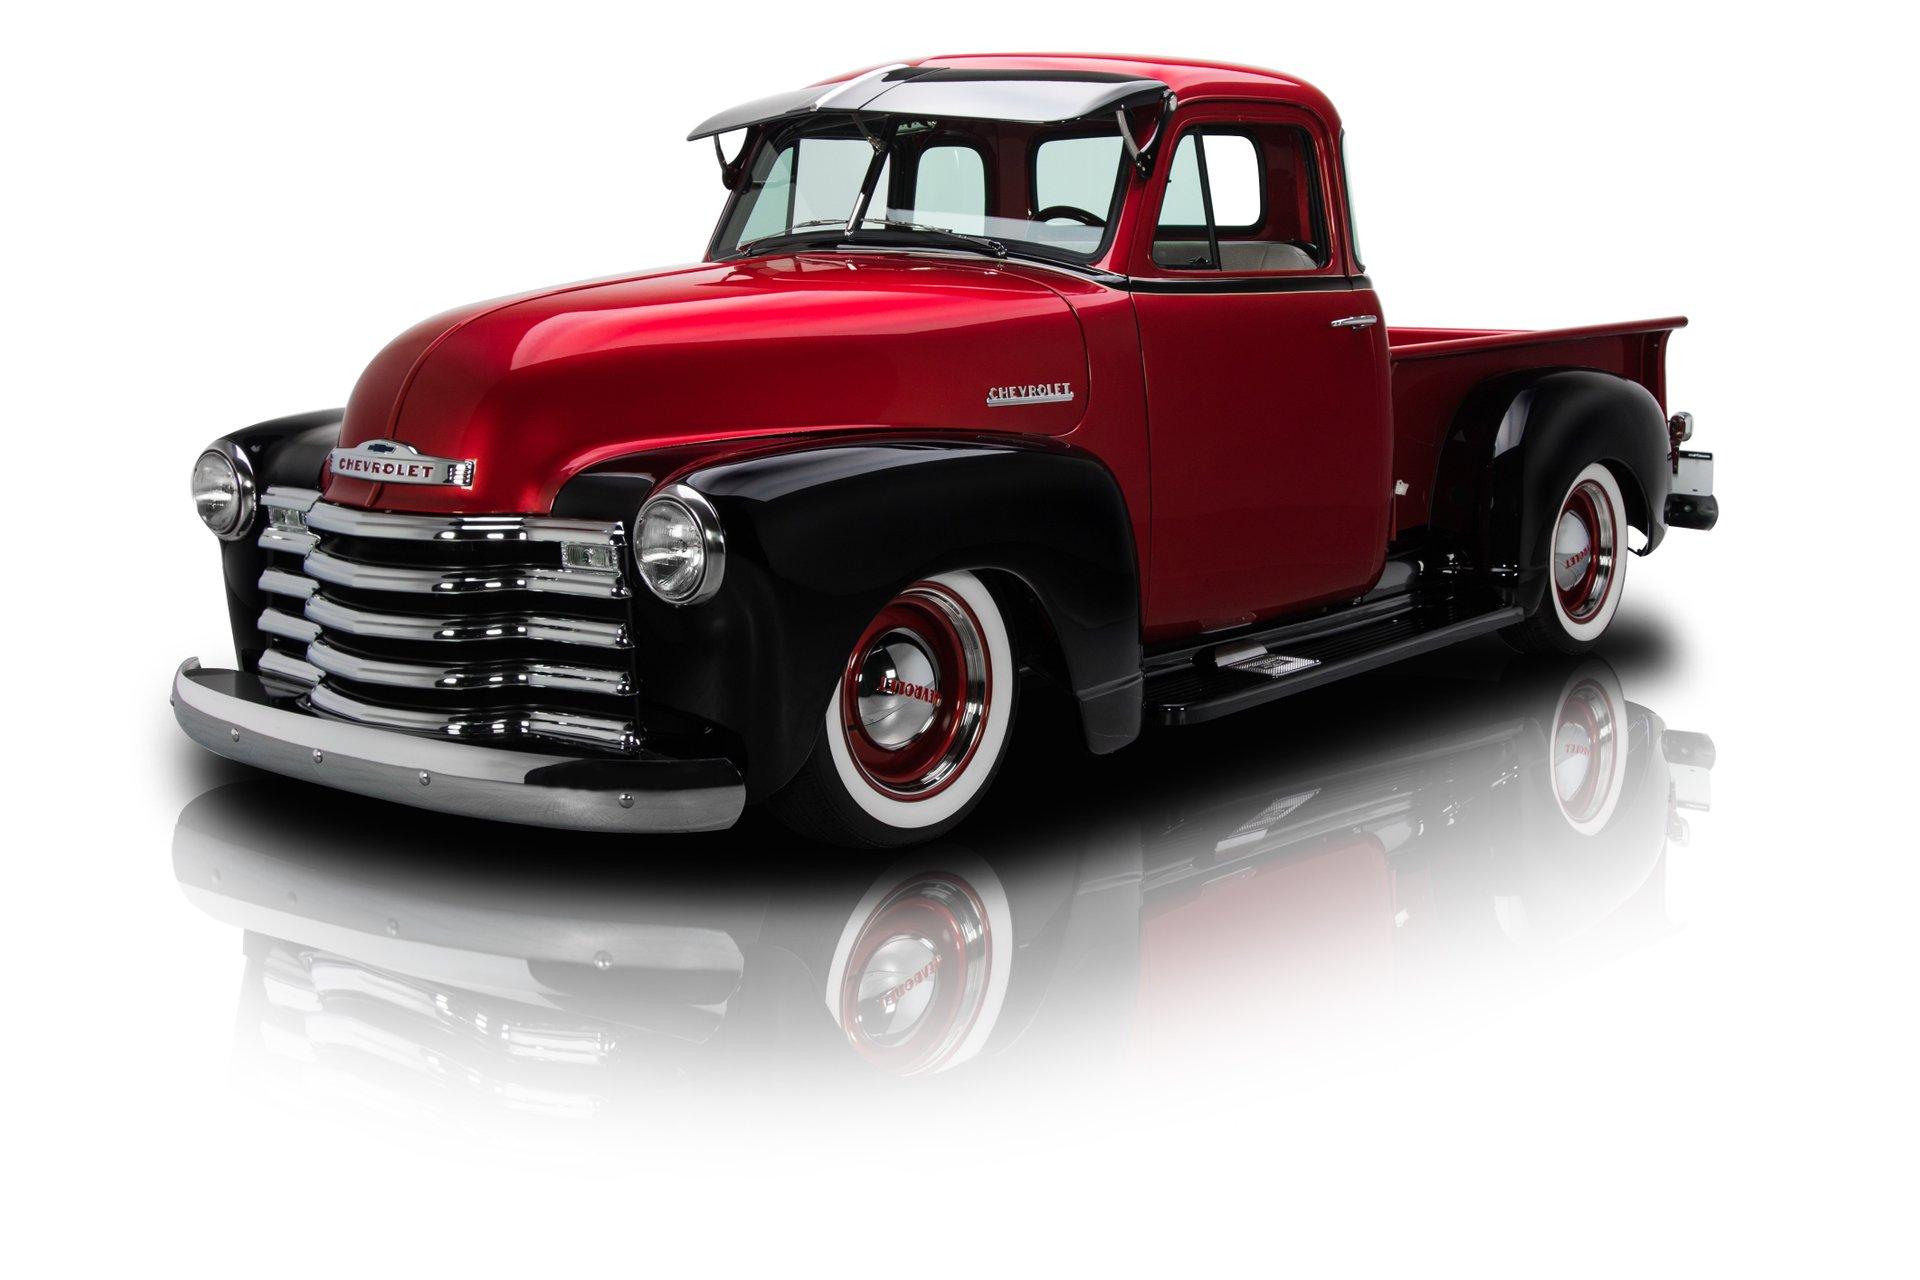 1951 chevrolet 3100 pickup truck